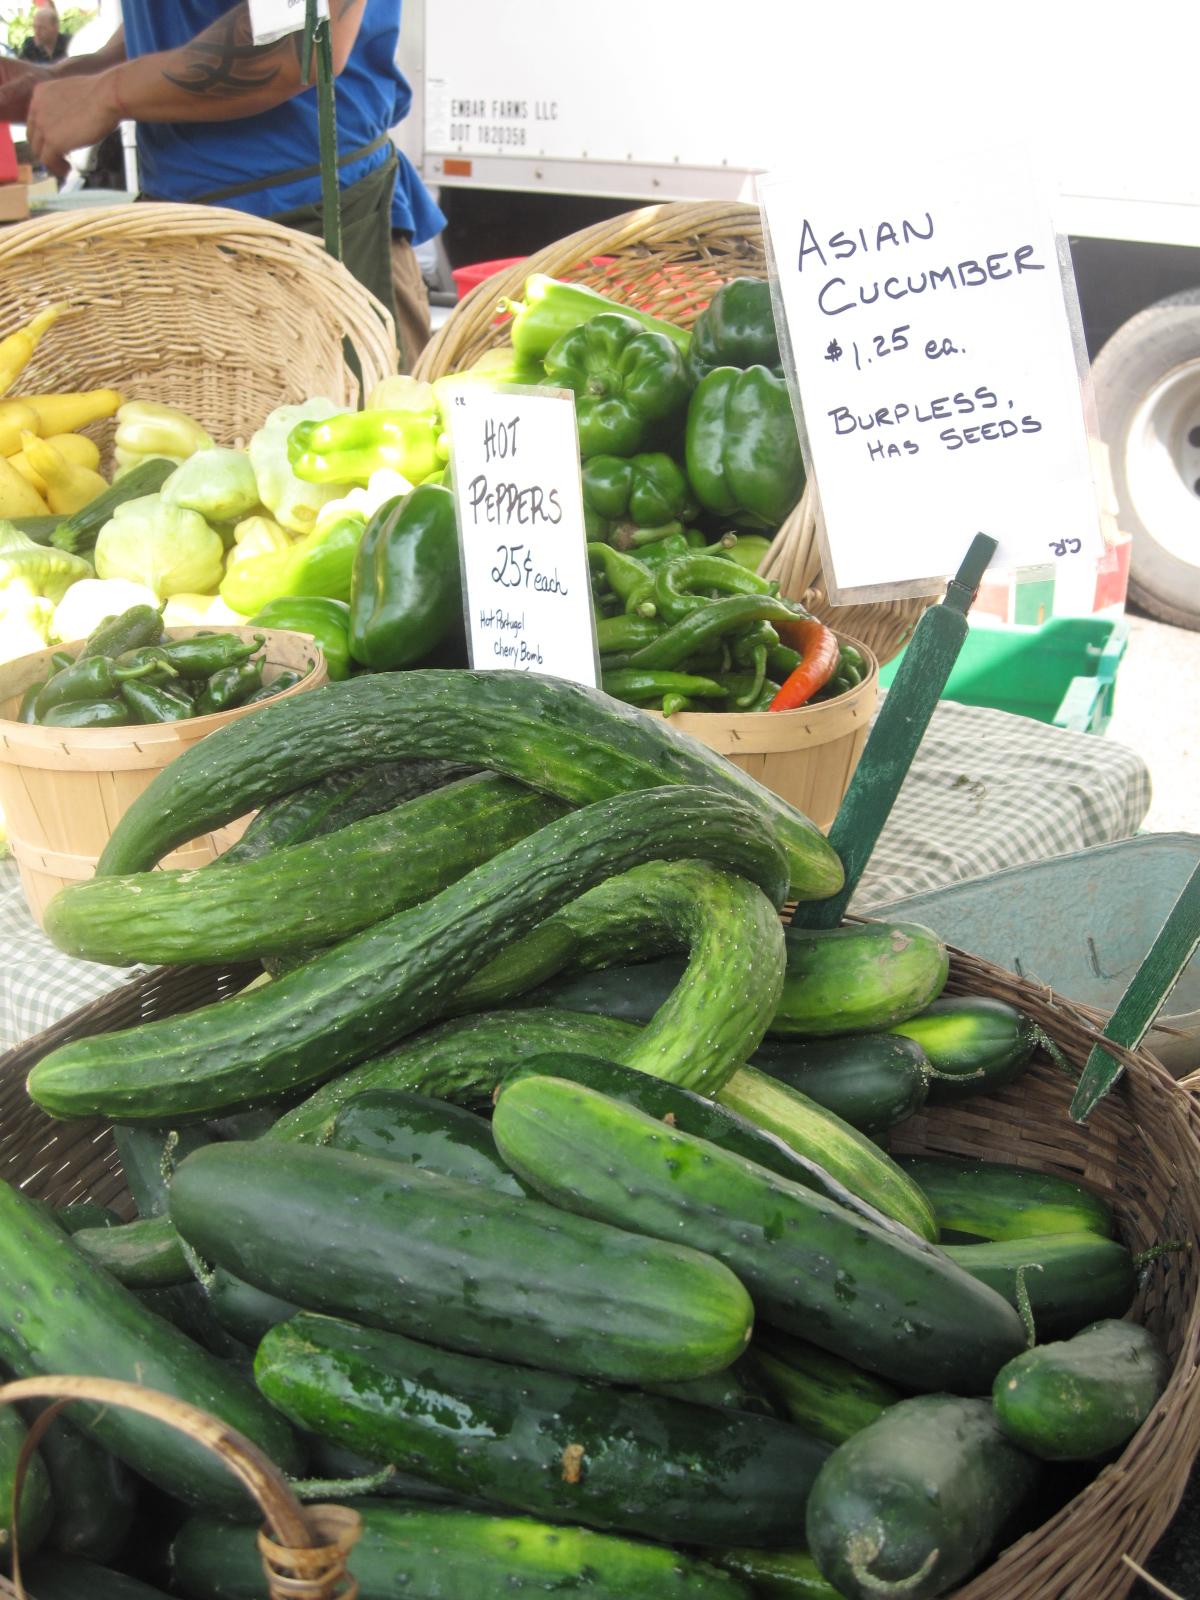 Cucumbers, regular and English